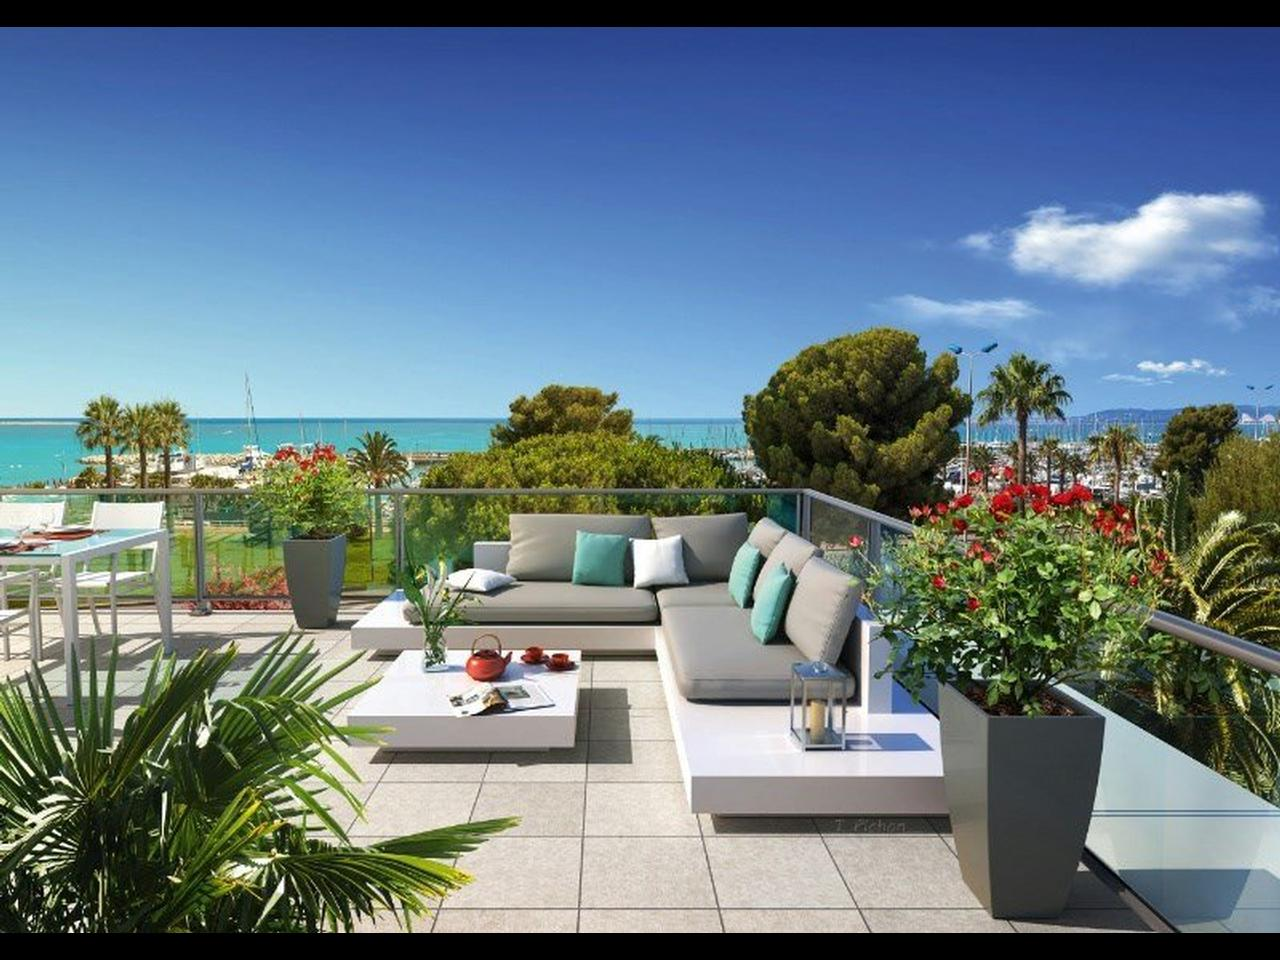 Immobilier nice vue mer appartement st laurent du var neuf - Appartement a vendre port vendres vue mer ...